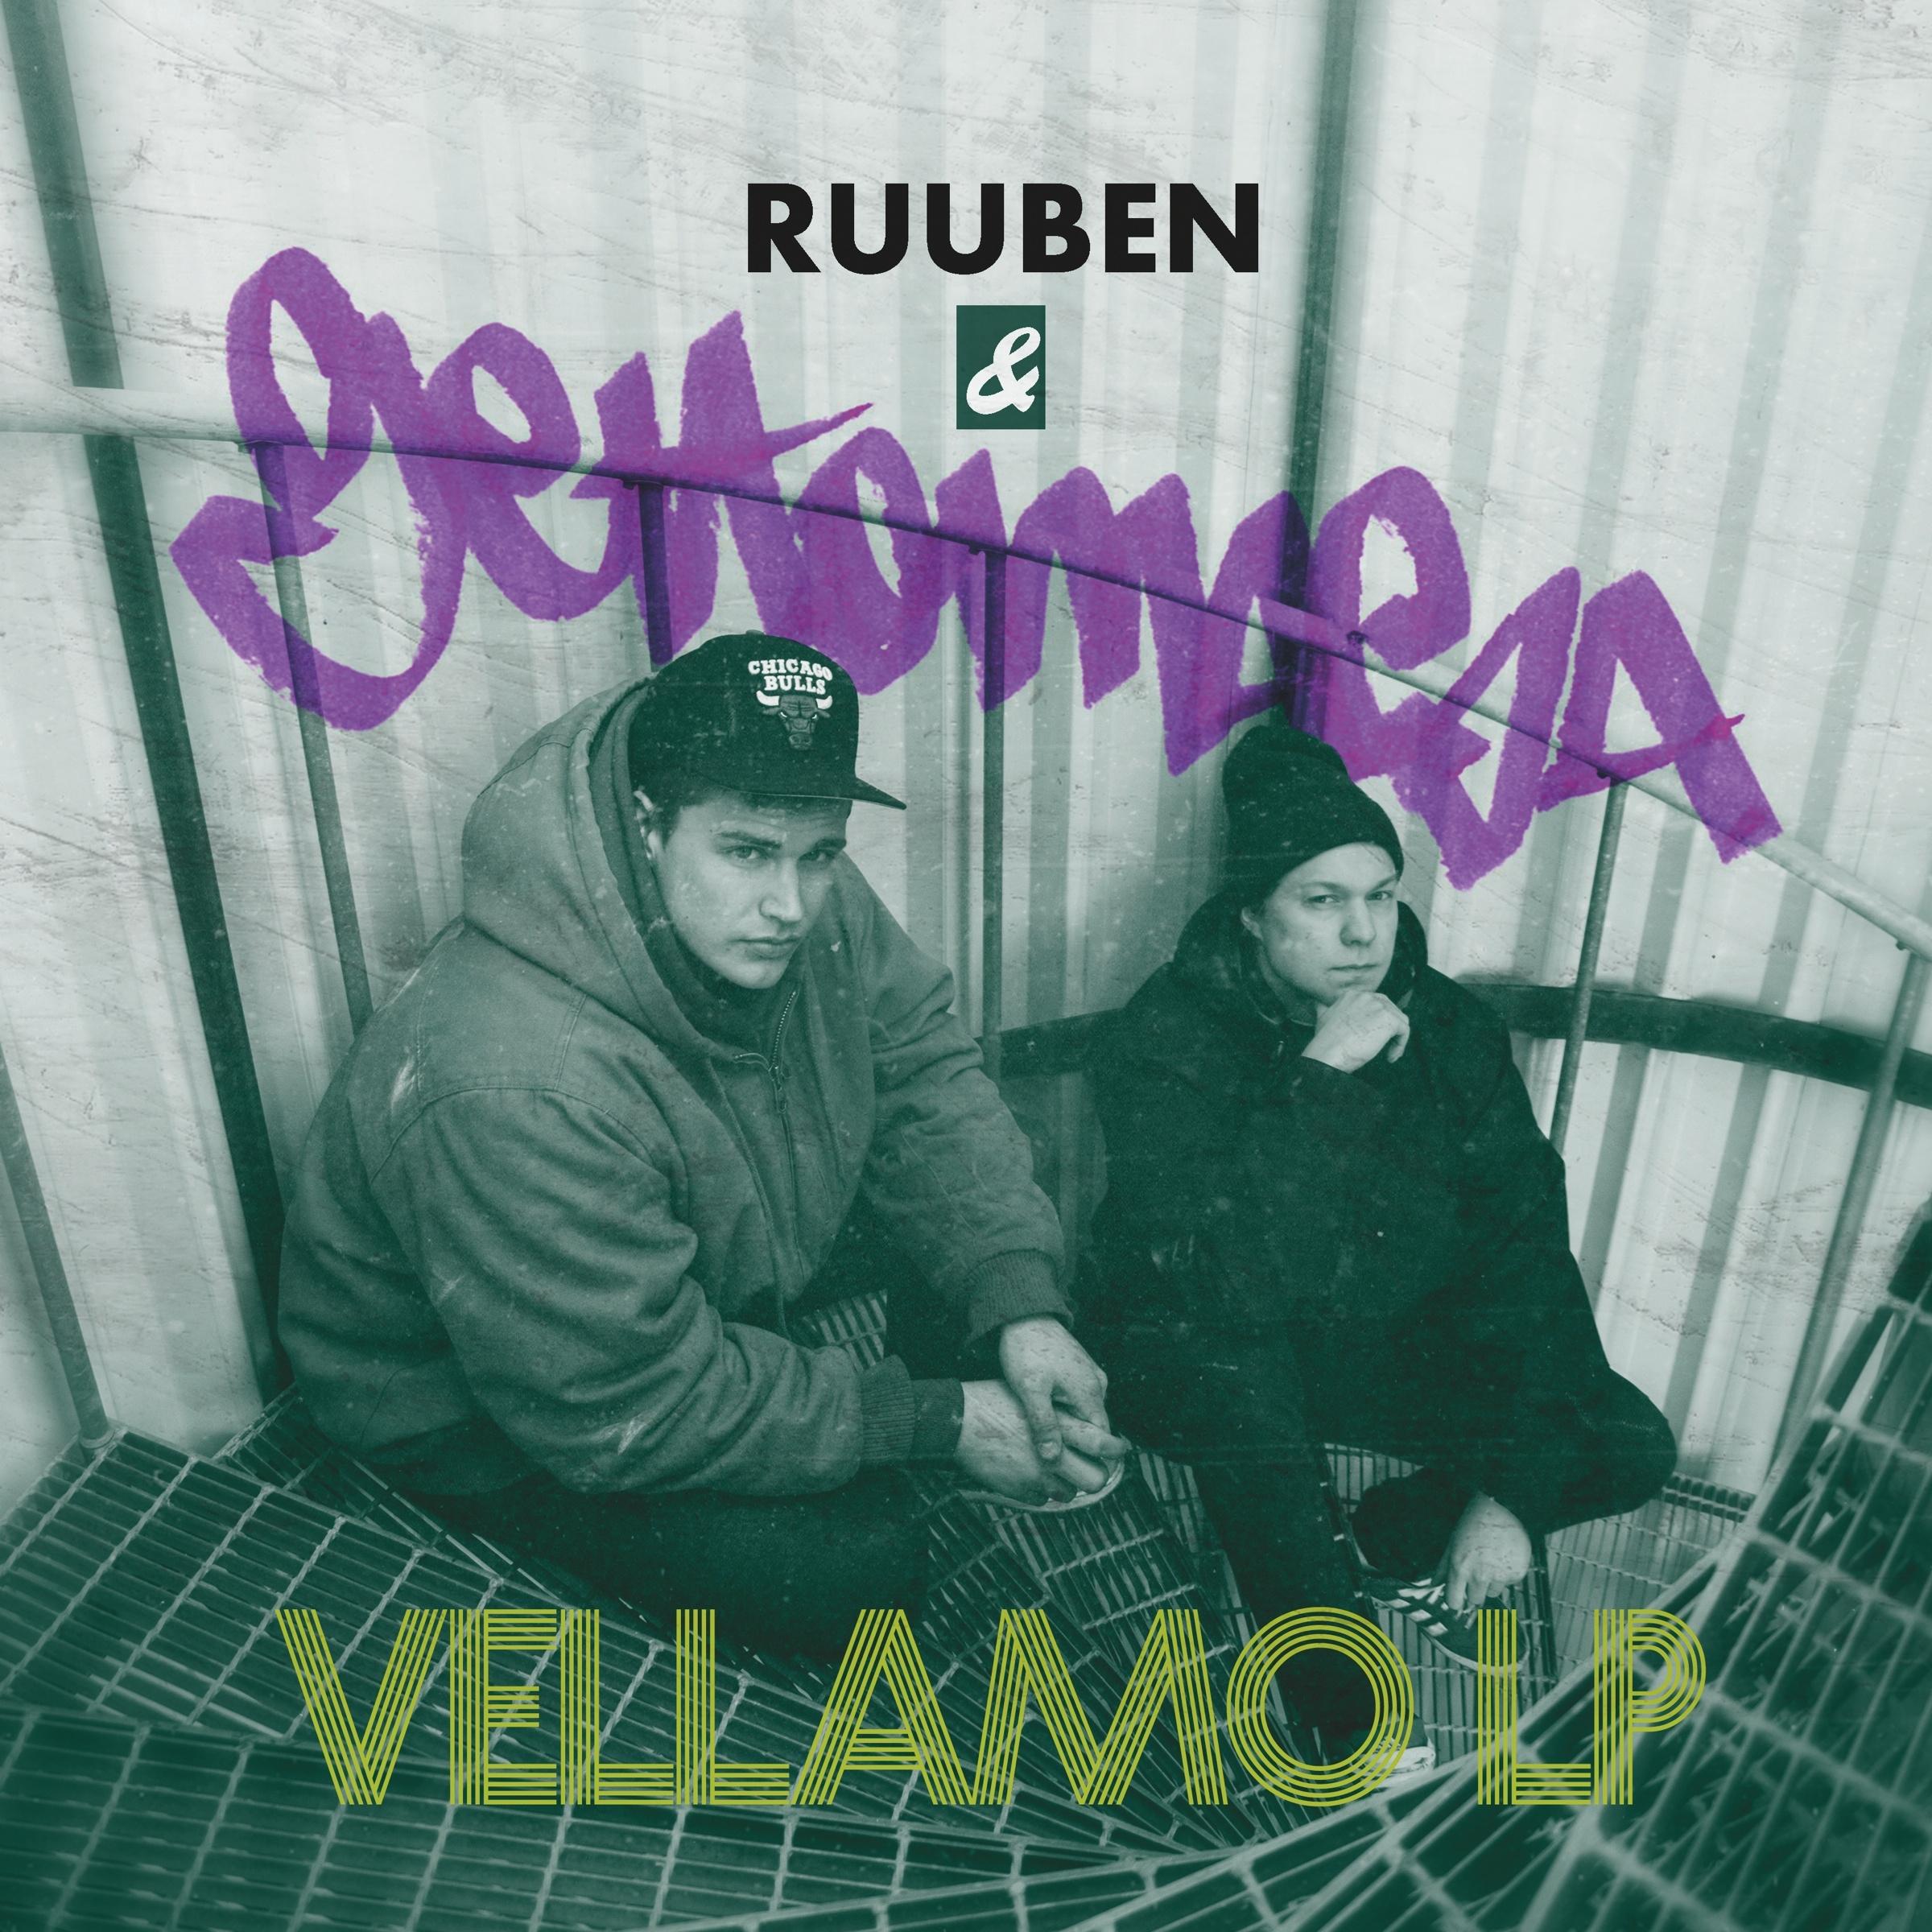 Gettomasa_&_Ruuben_-_Vellamo_LP_artwork